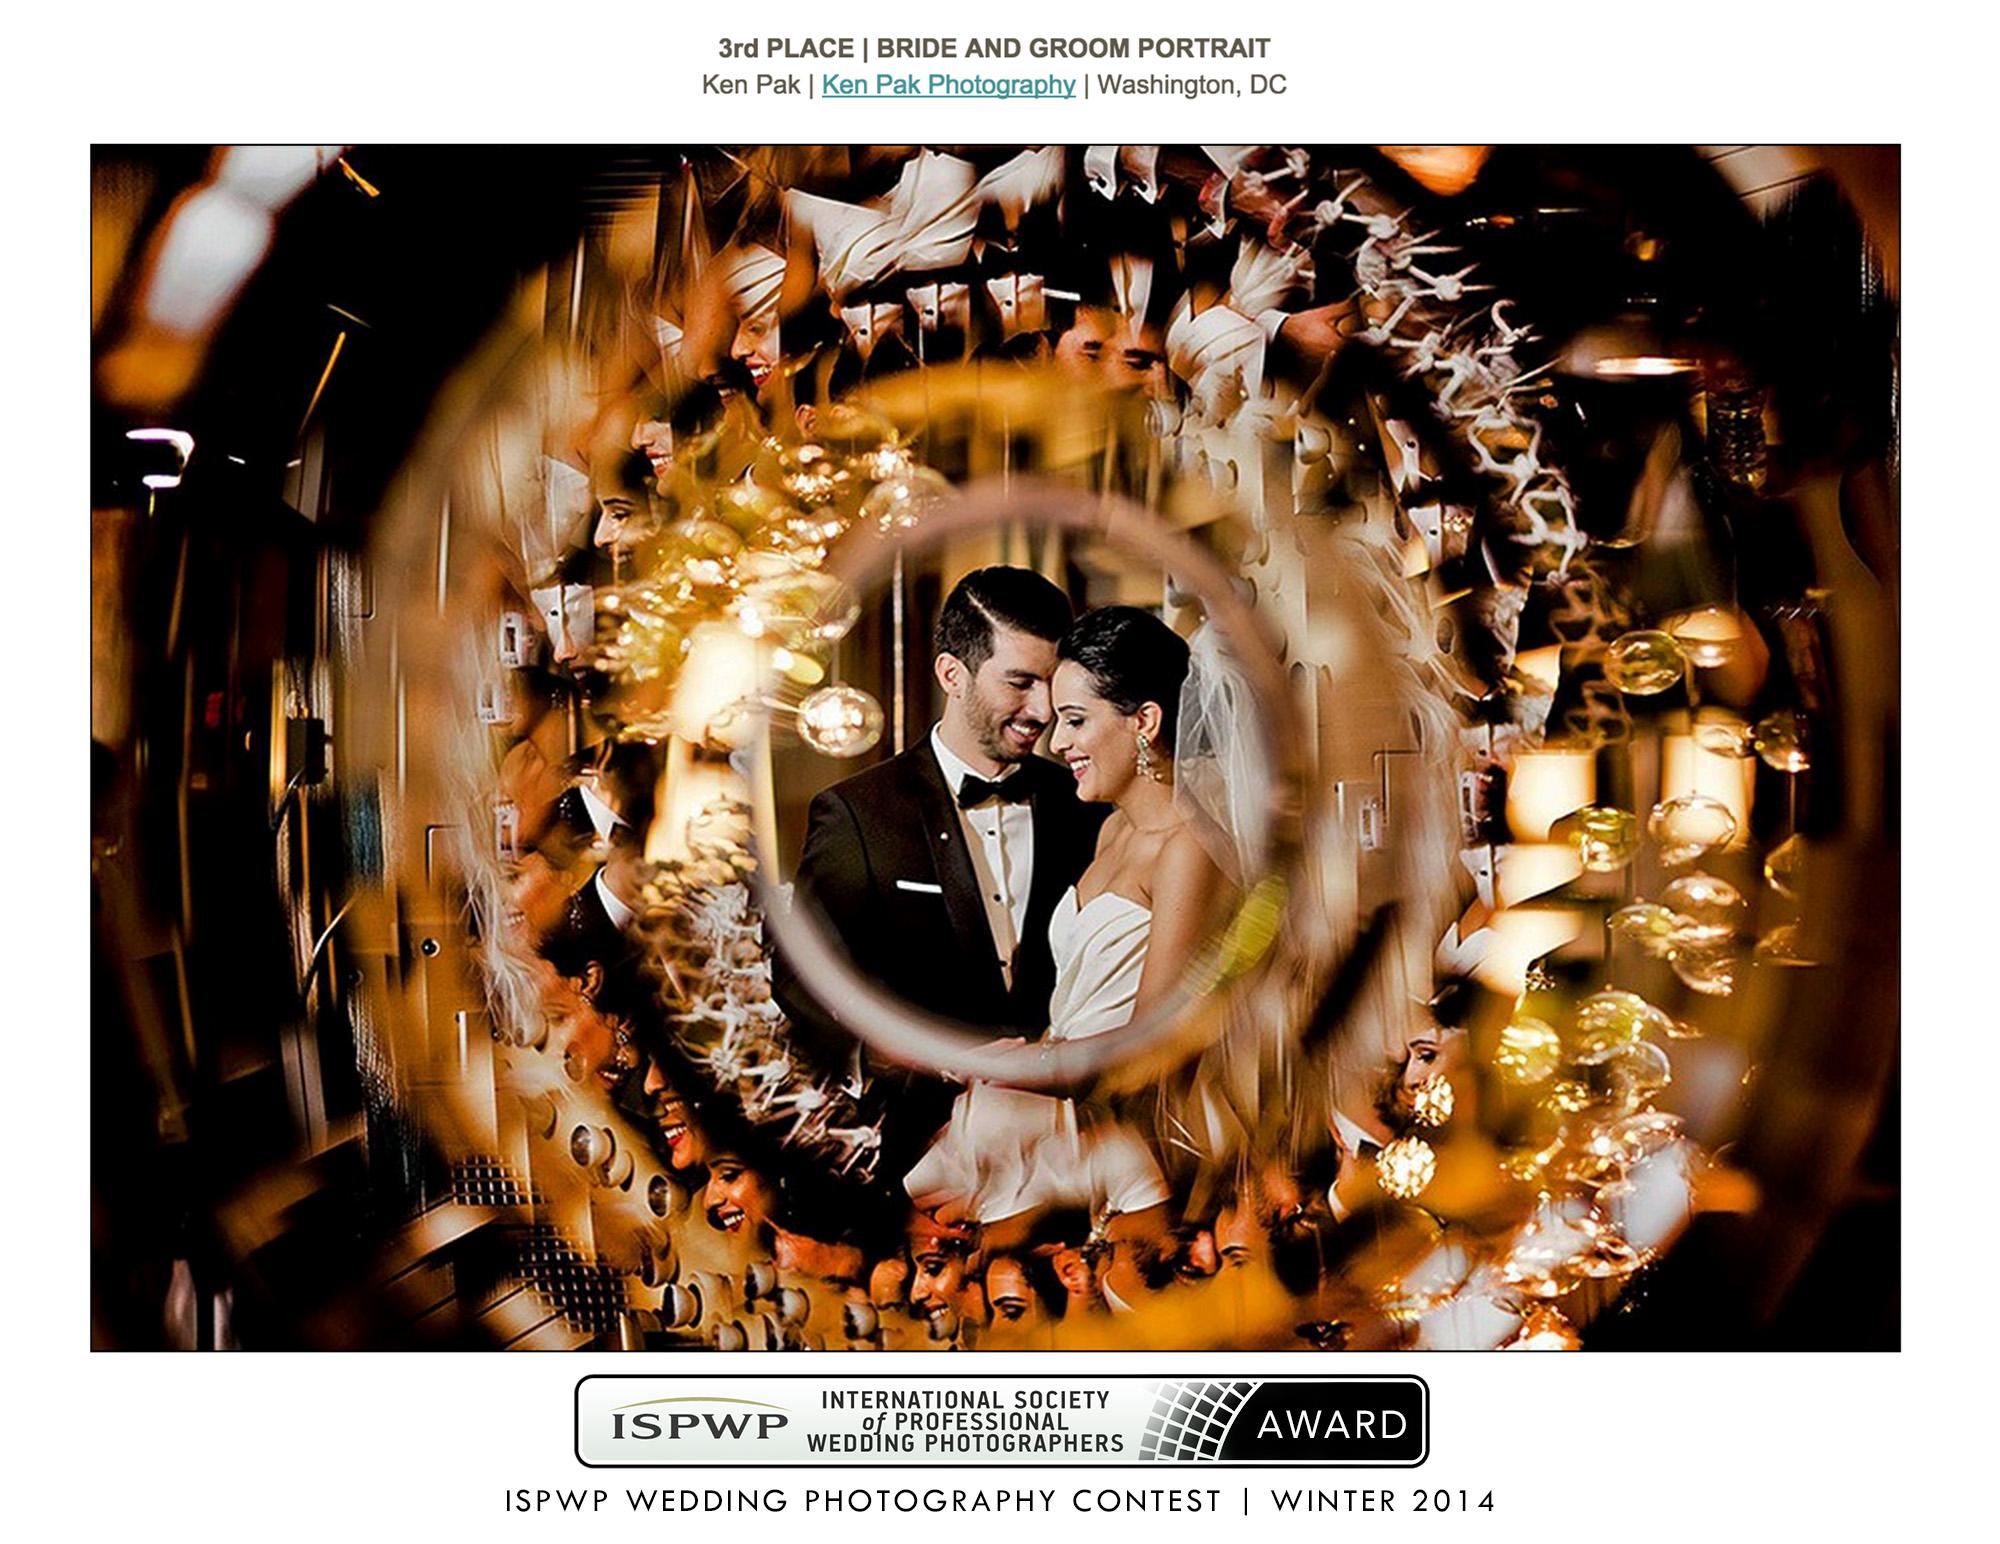 ISPWP 2014 WINTER BRIDE & GROOM PORTRAIT 3.jpg